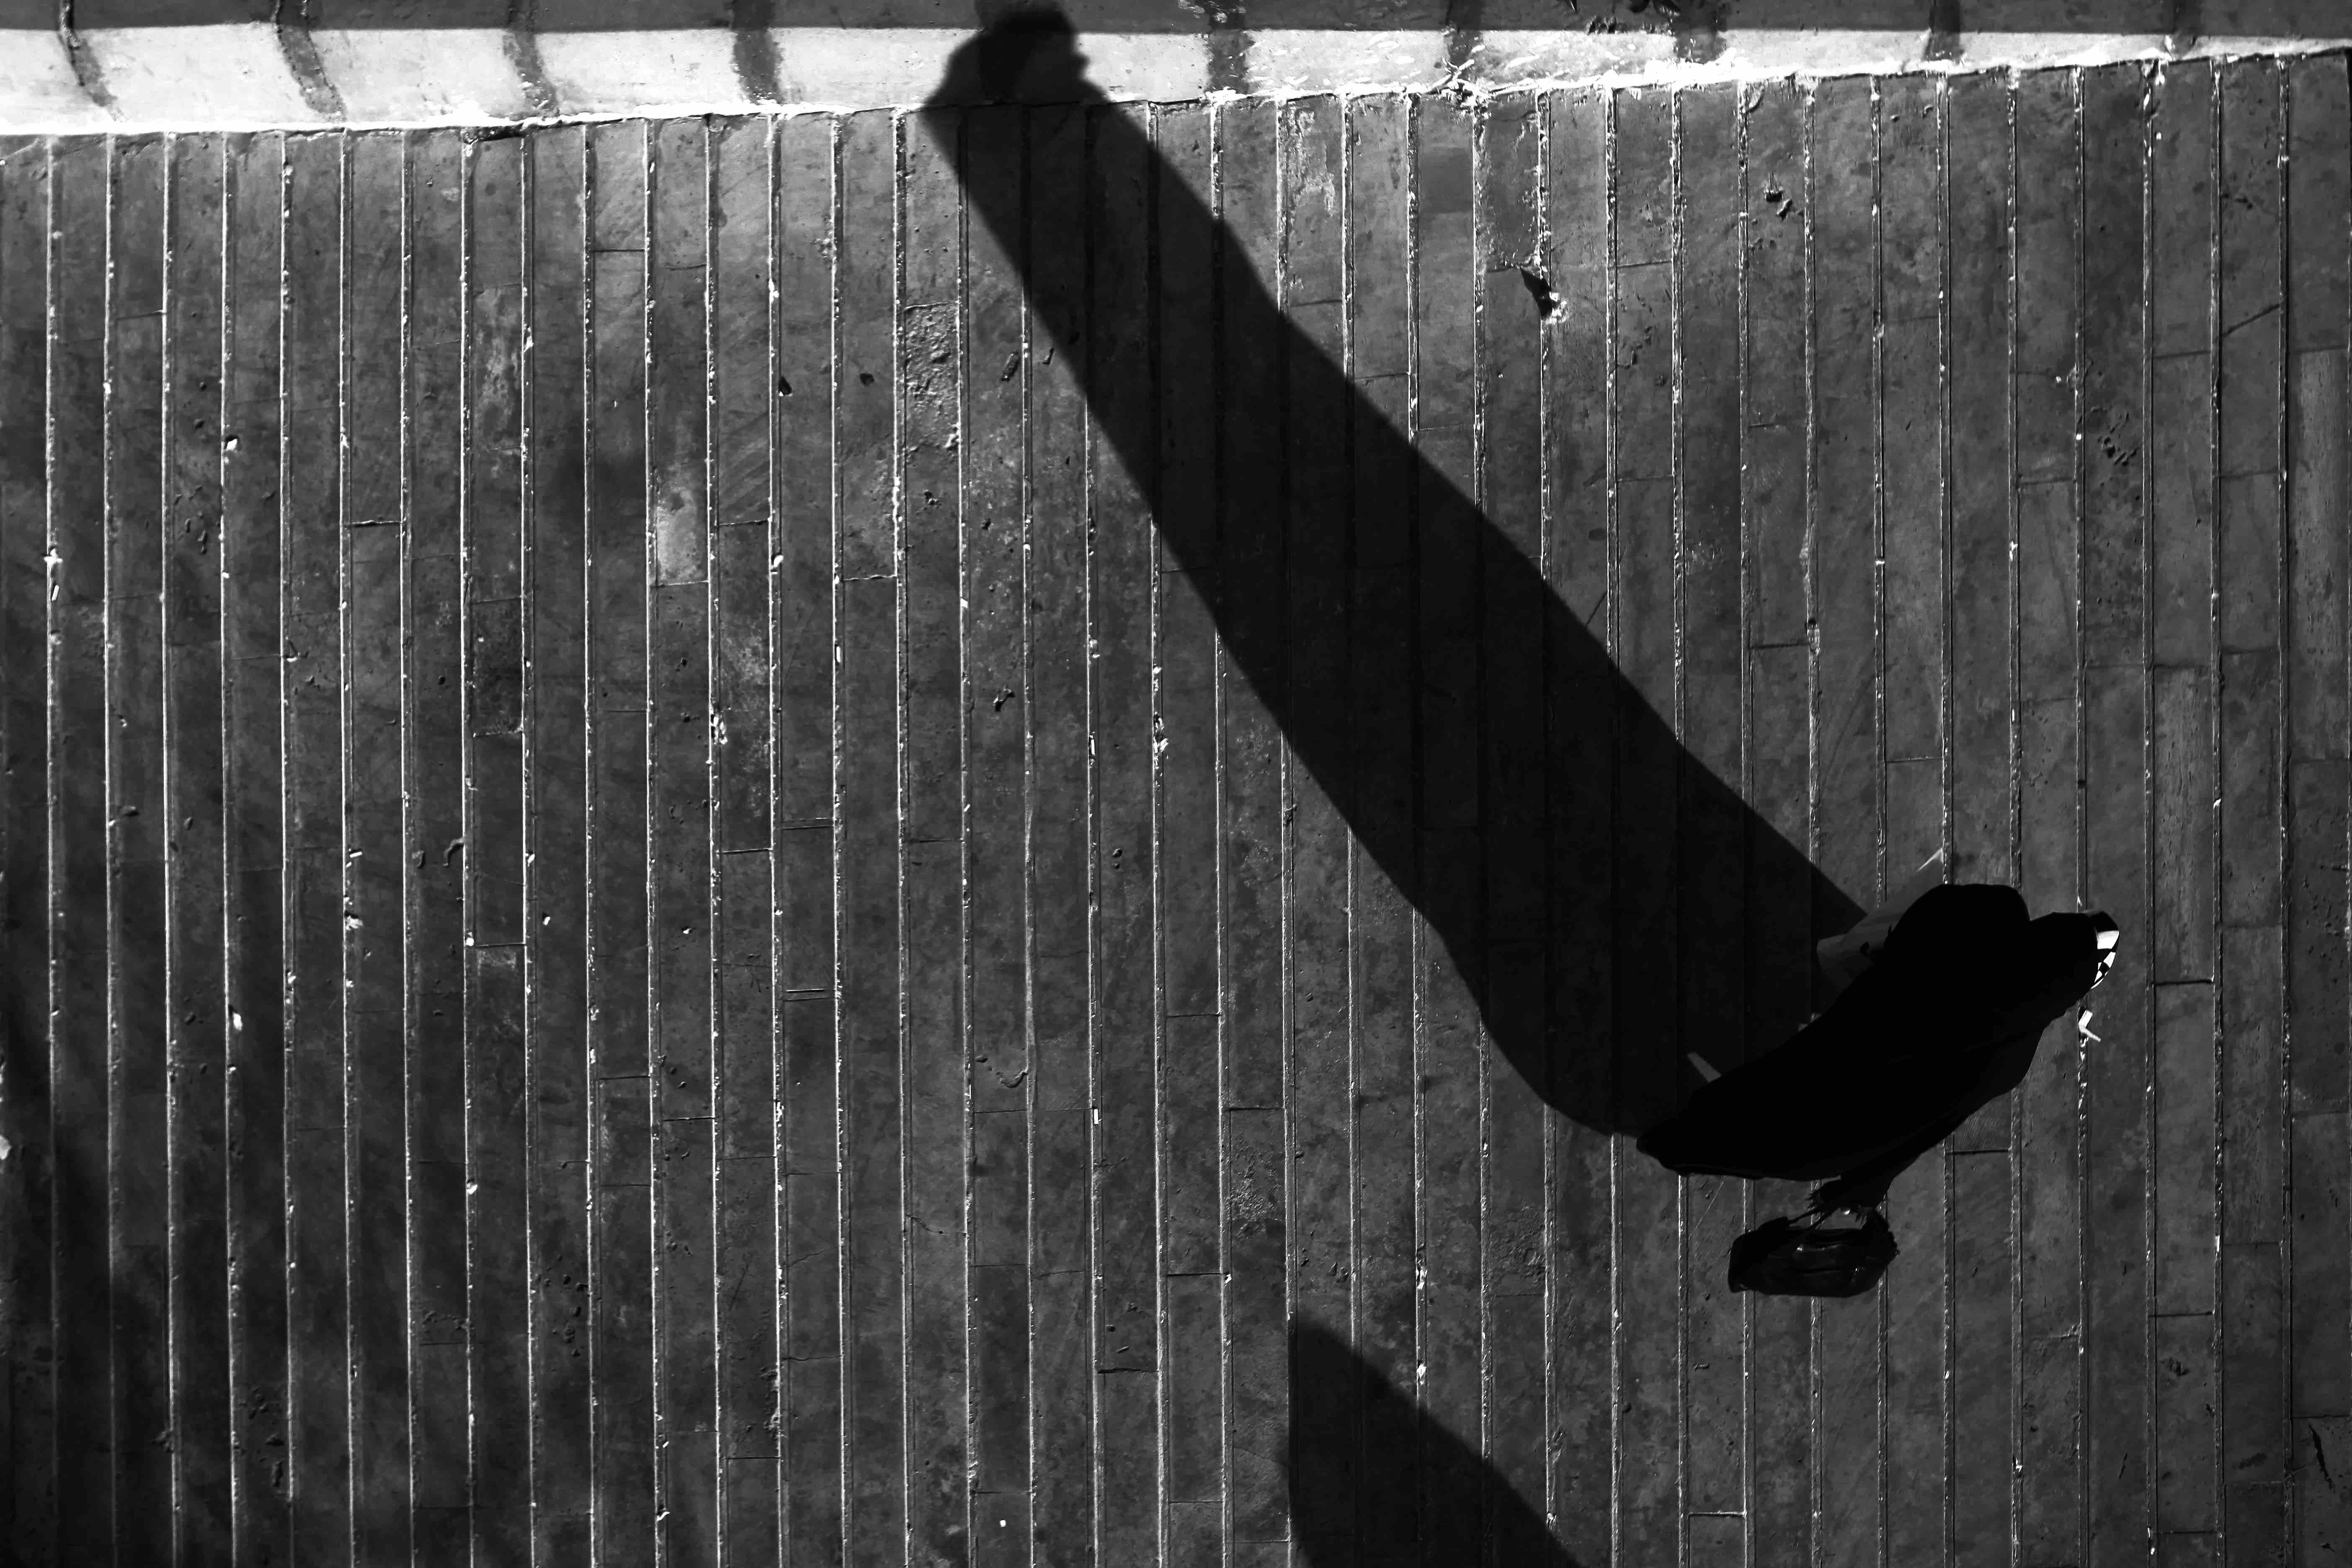 Untitled (11)_ The Life Of Shadows Series - Nehdaran_ Dana